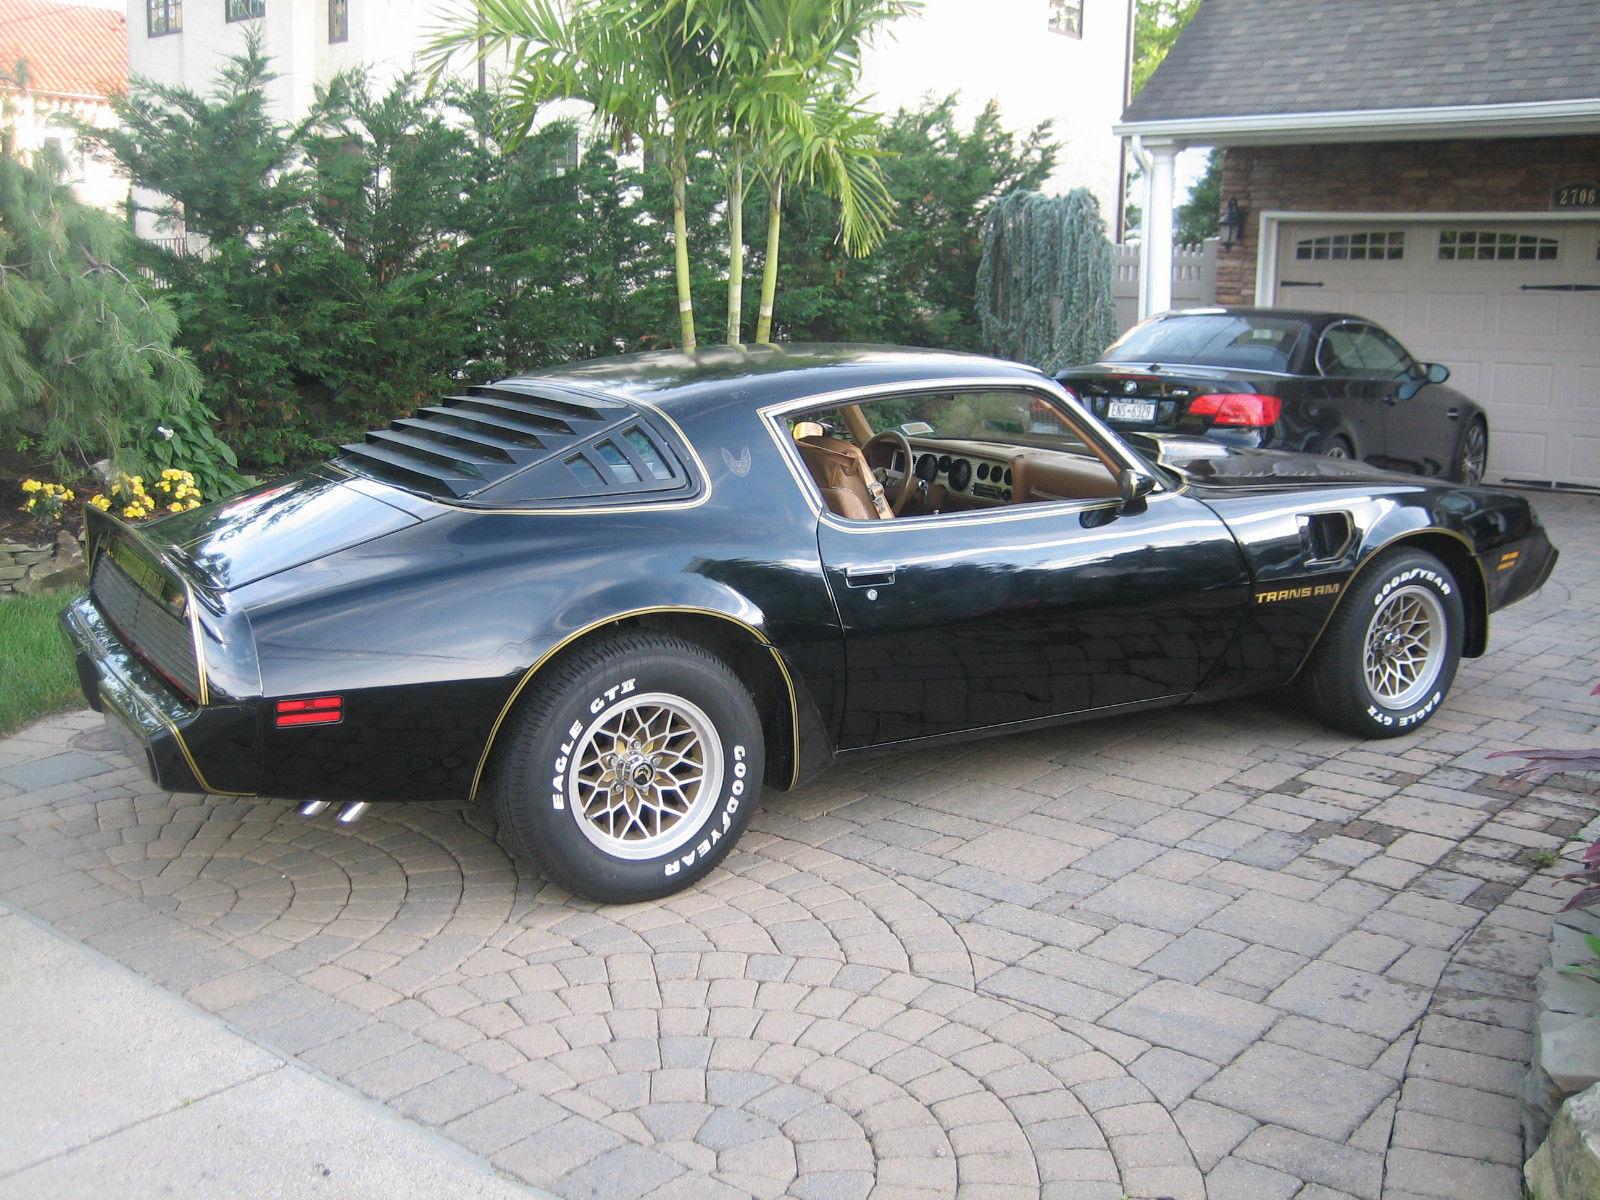 1979 Pontiac Trans Am Ws6 Ta 66l 400 4 Speed Muscle Car 1978 Firebird Wiring Diagram 1454